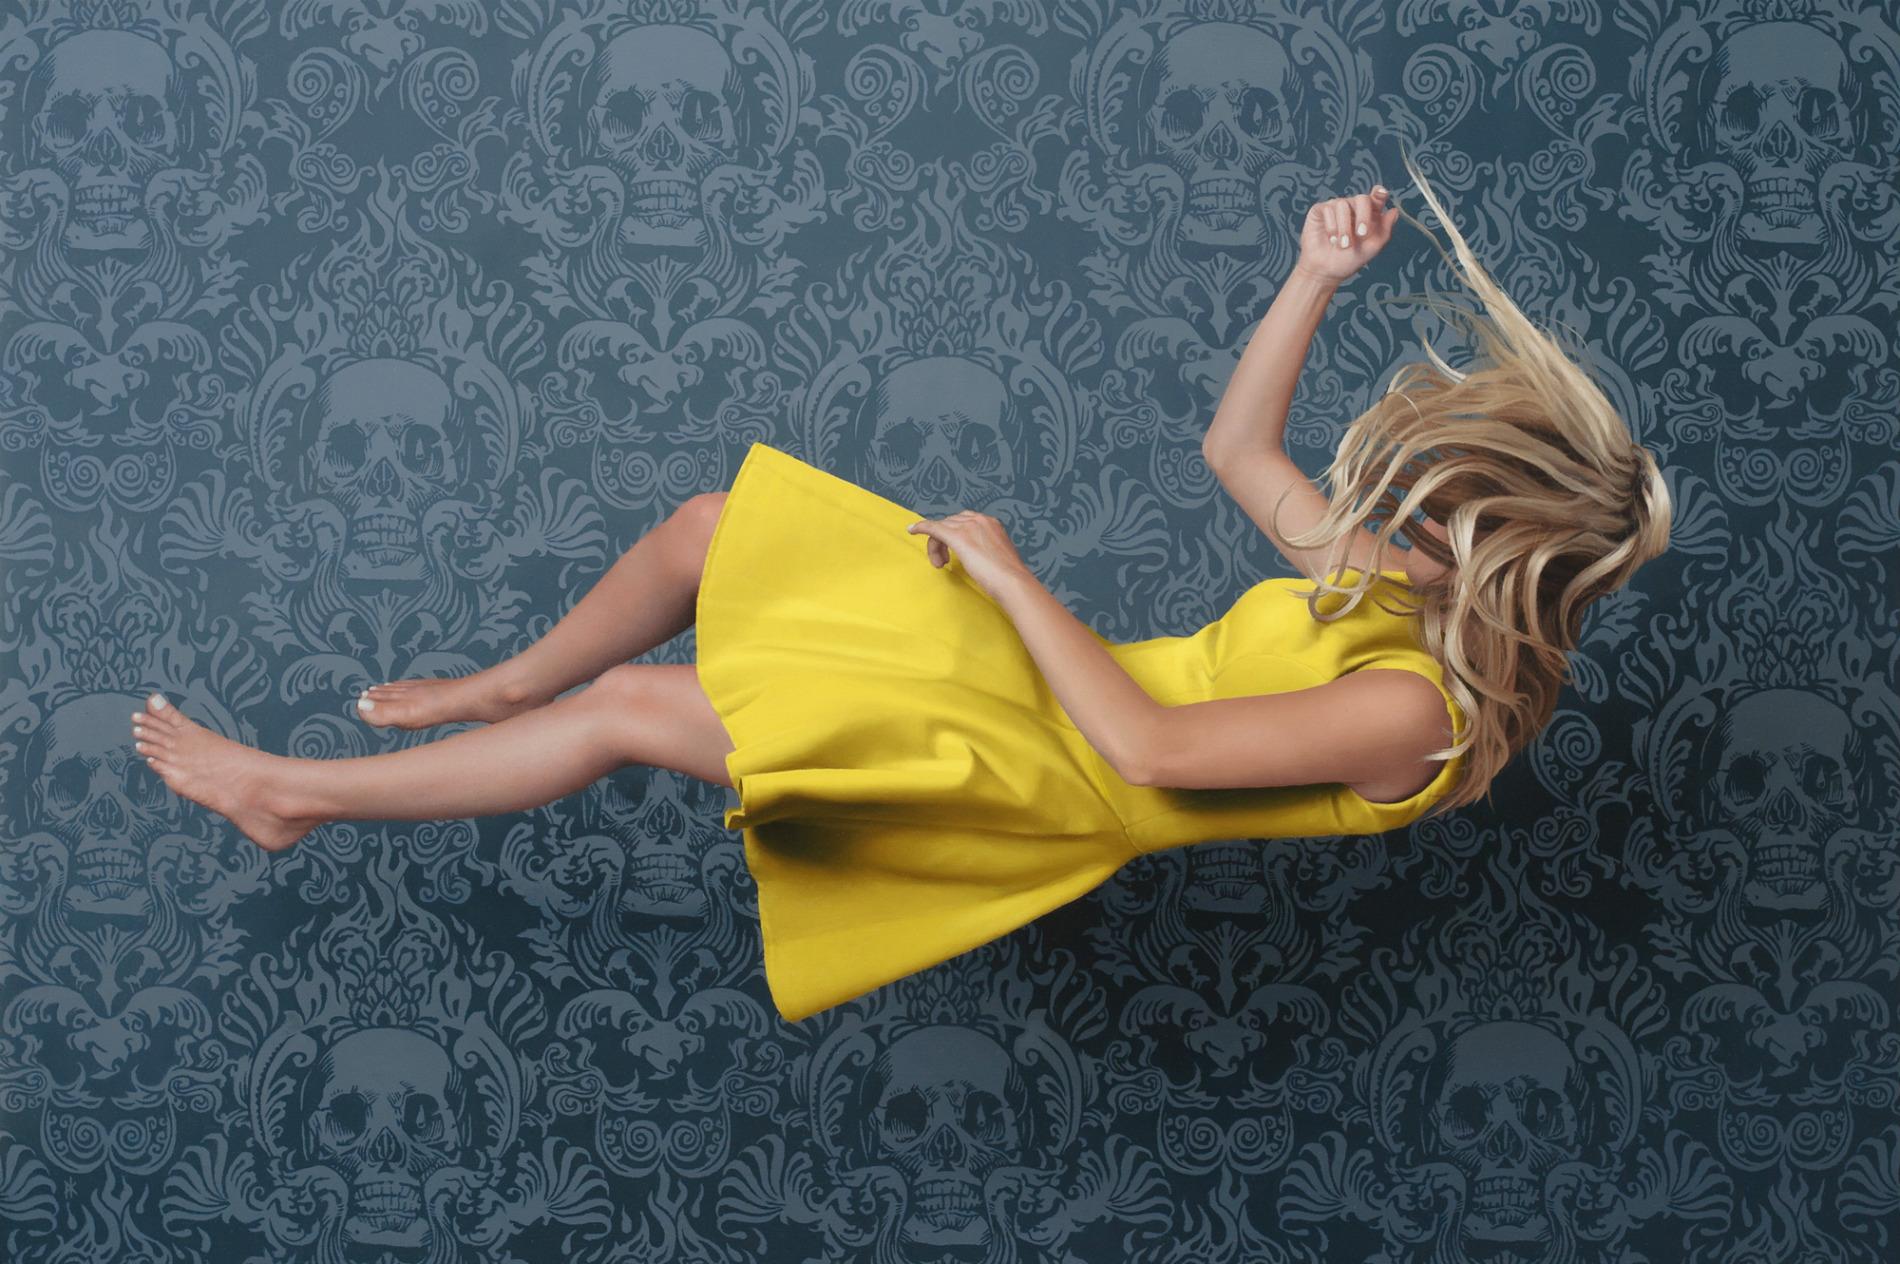 patrick kramer hyperrealist paintings yellow dress wallpaper